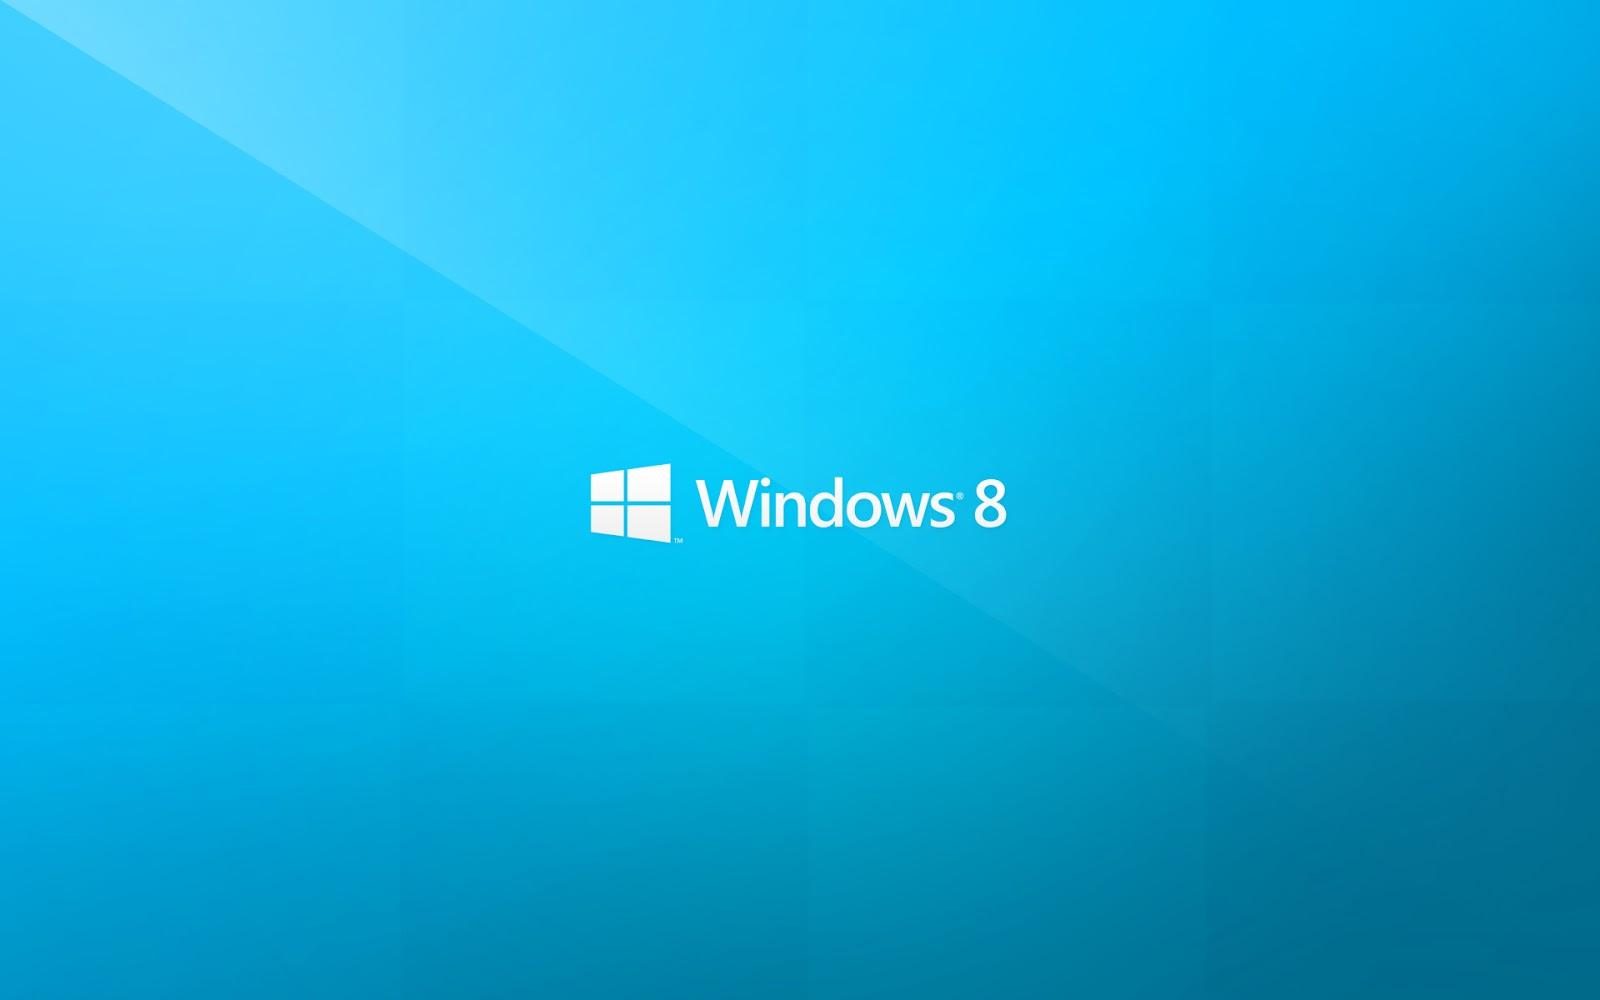 Windows 8 Blue Hi Tech Wallpaper Fondos de Pantalla para Windowsjpg 1600x1000